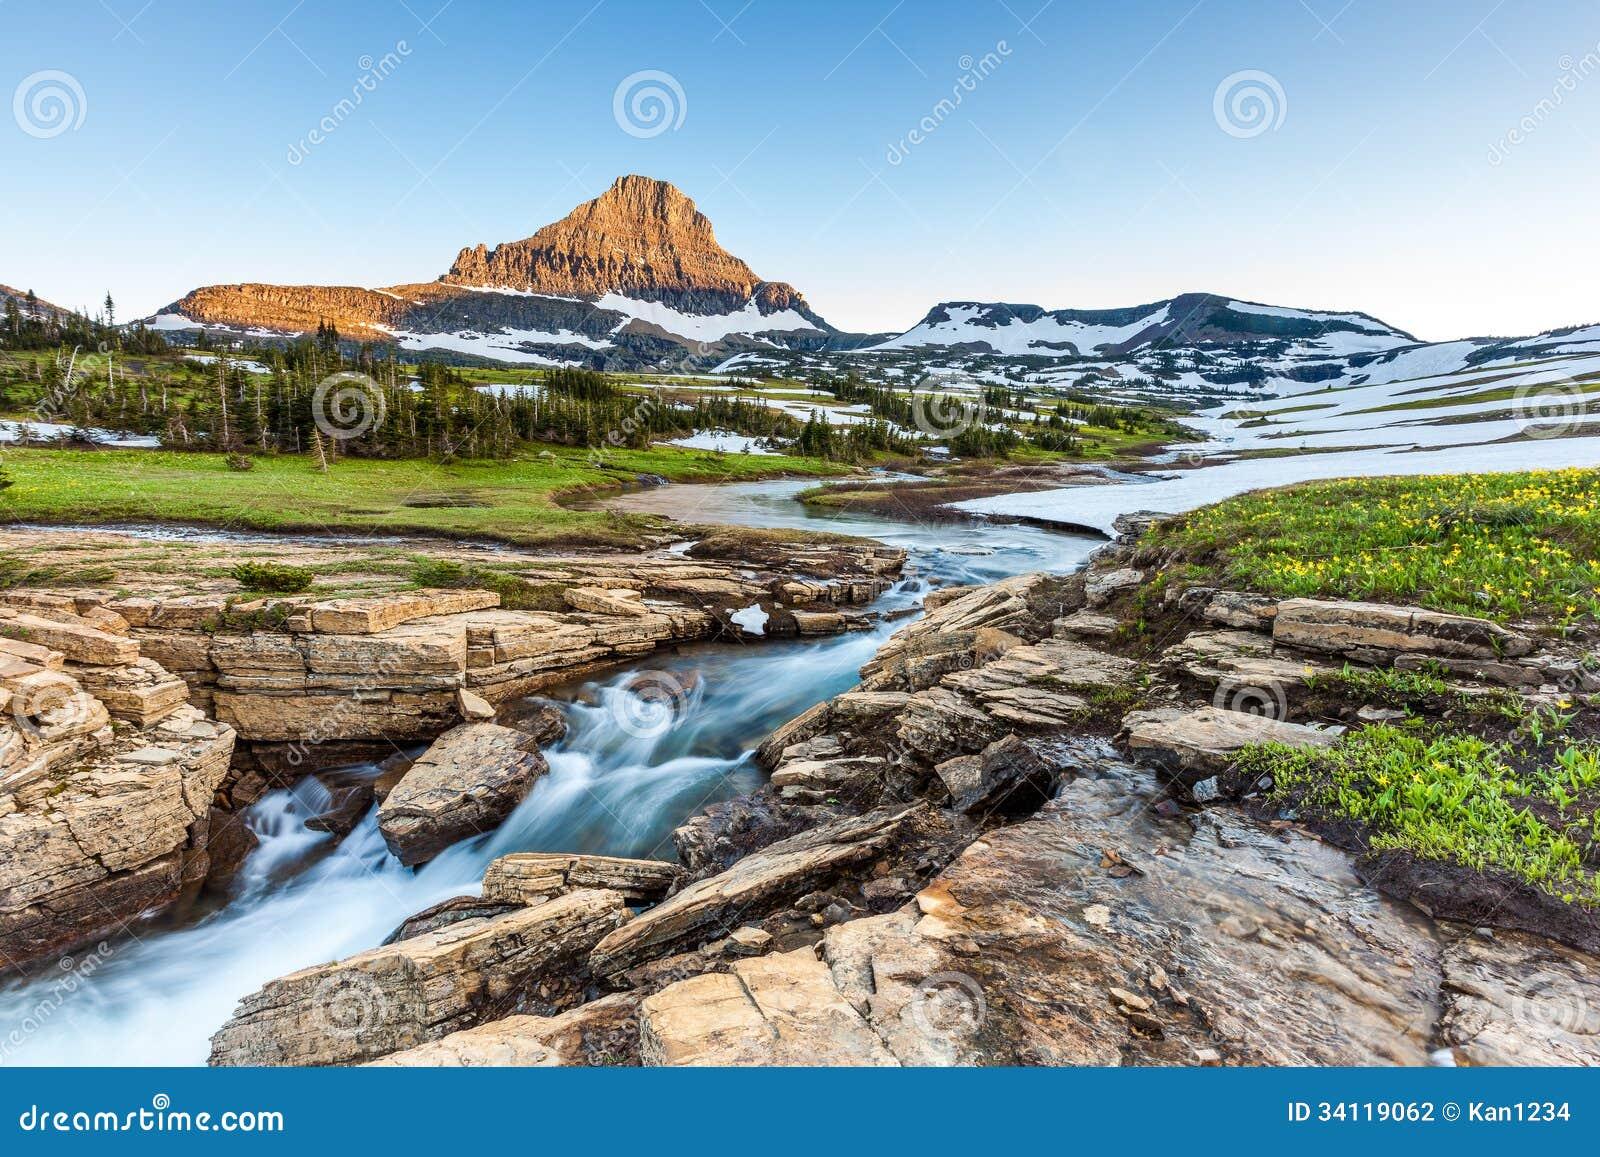 Beautiful nature at Logan Pass, Glacier National Park, MT